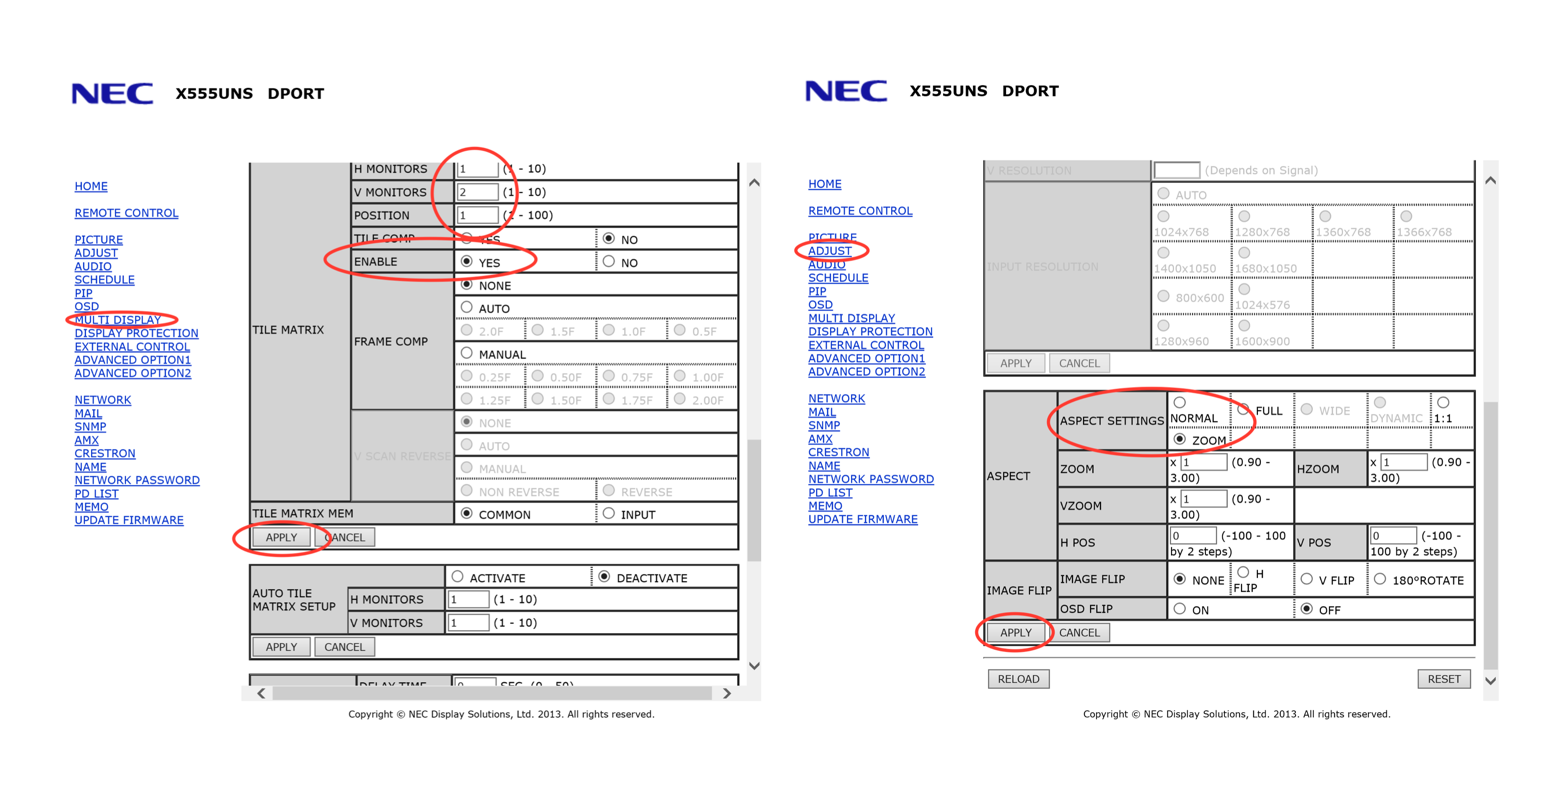 Figure 6: NEC Display Settings